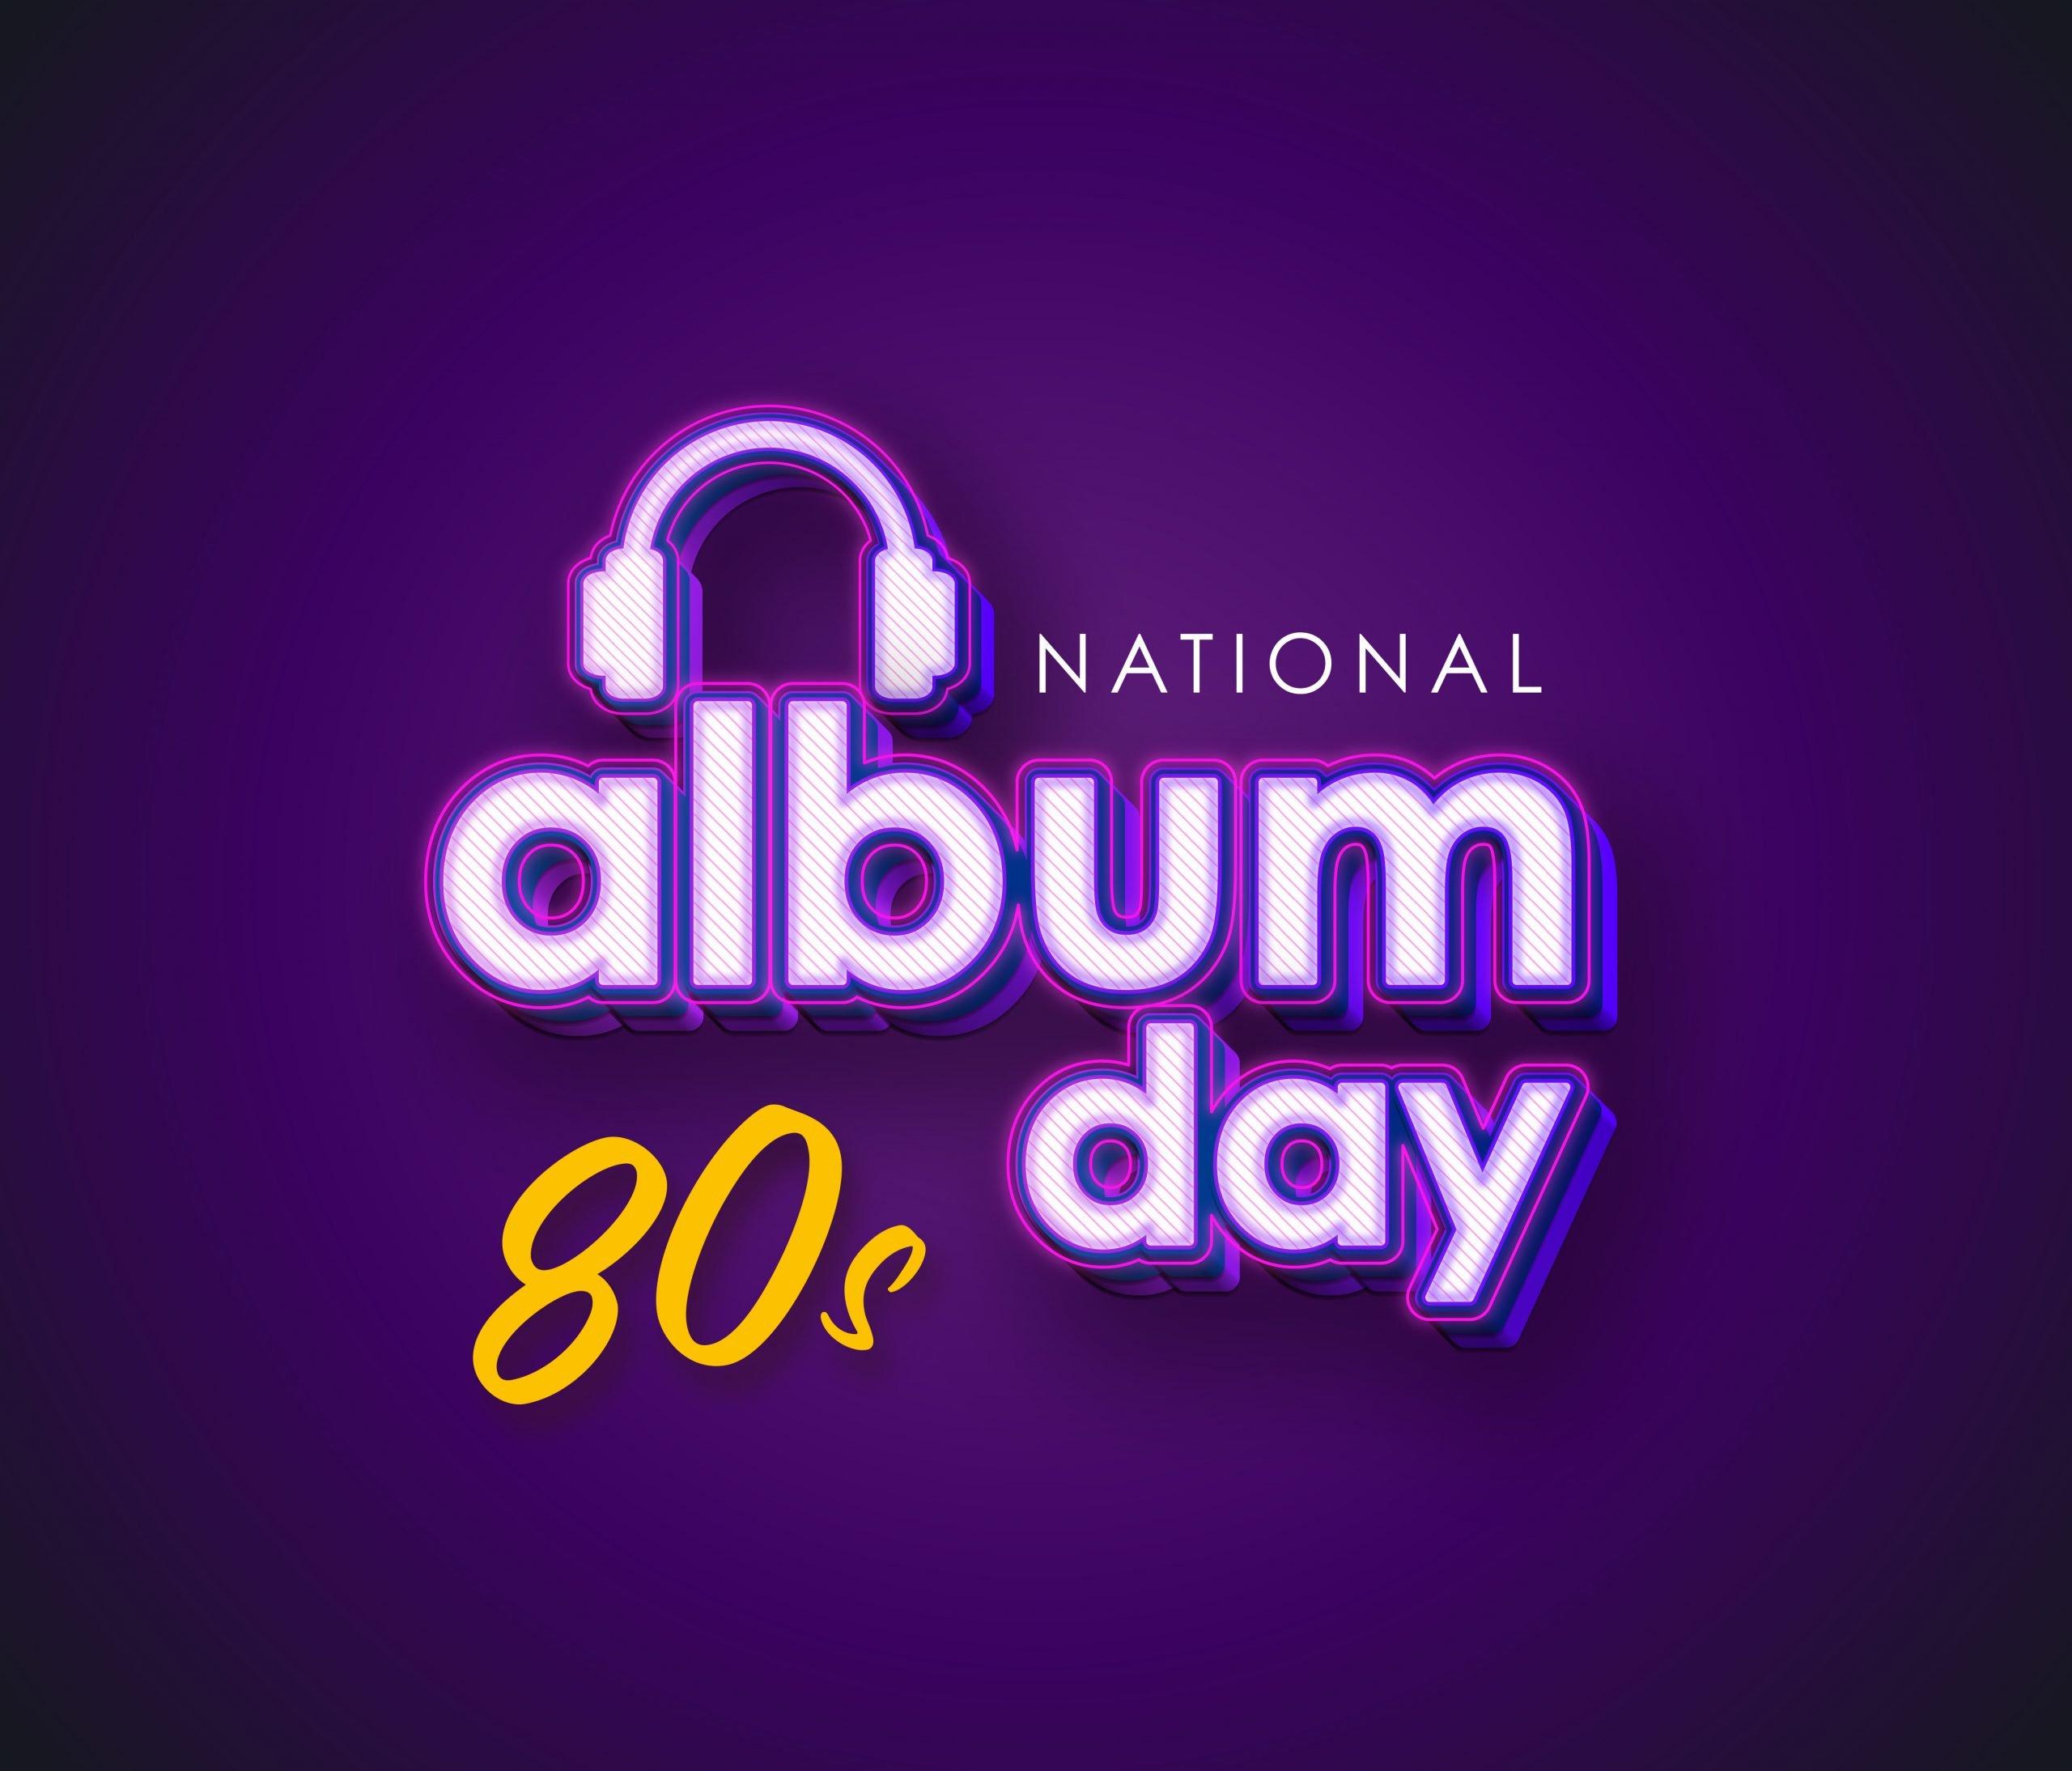 National album day logo and brand design